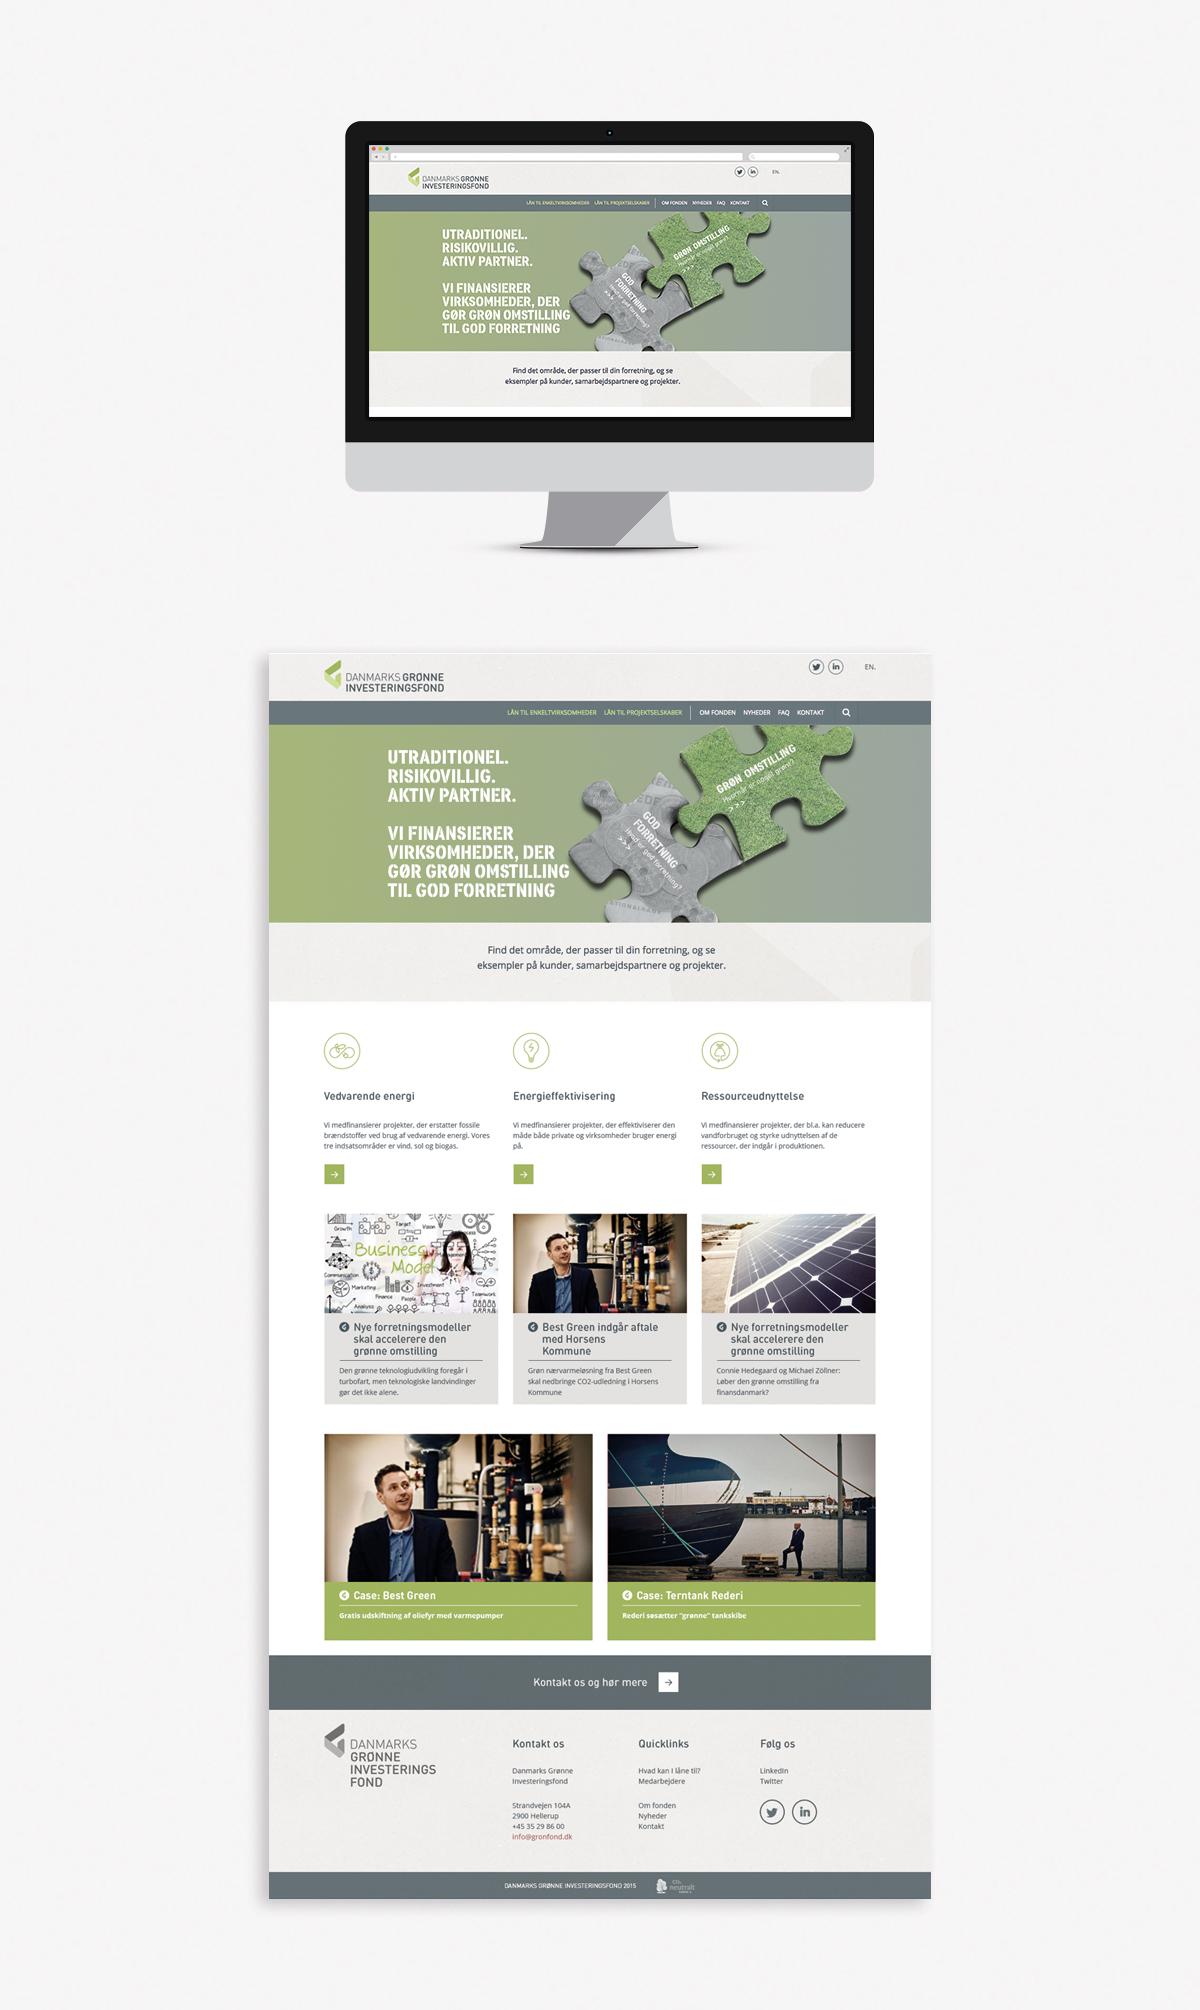 Gronfond-kommunikationsplatform_03_web